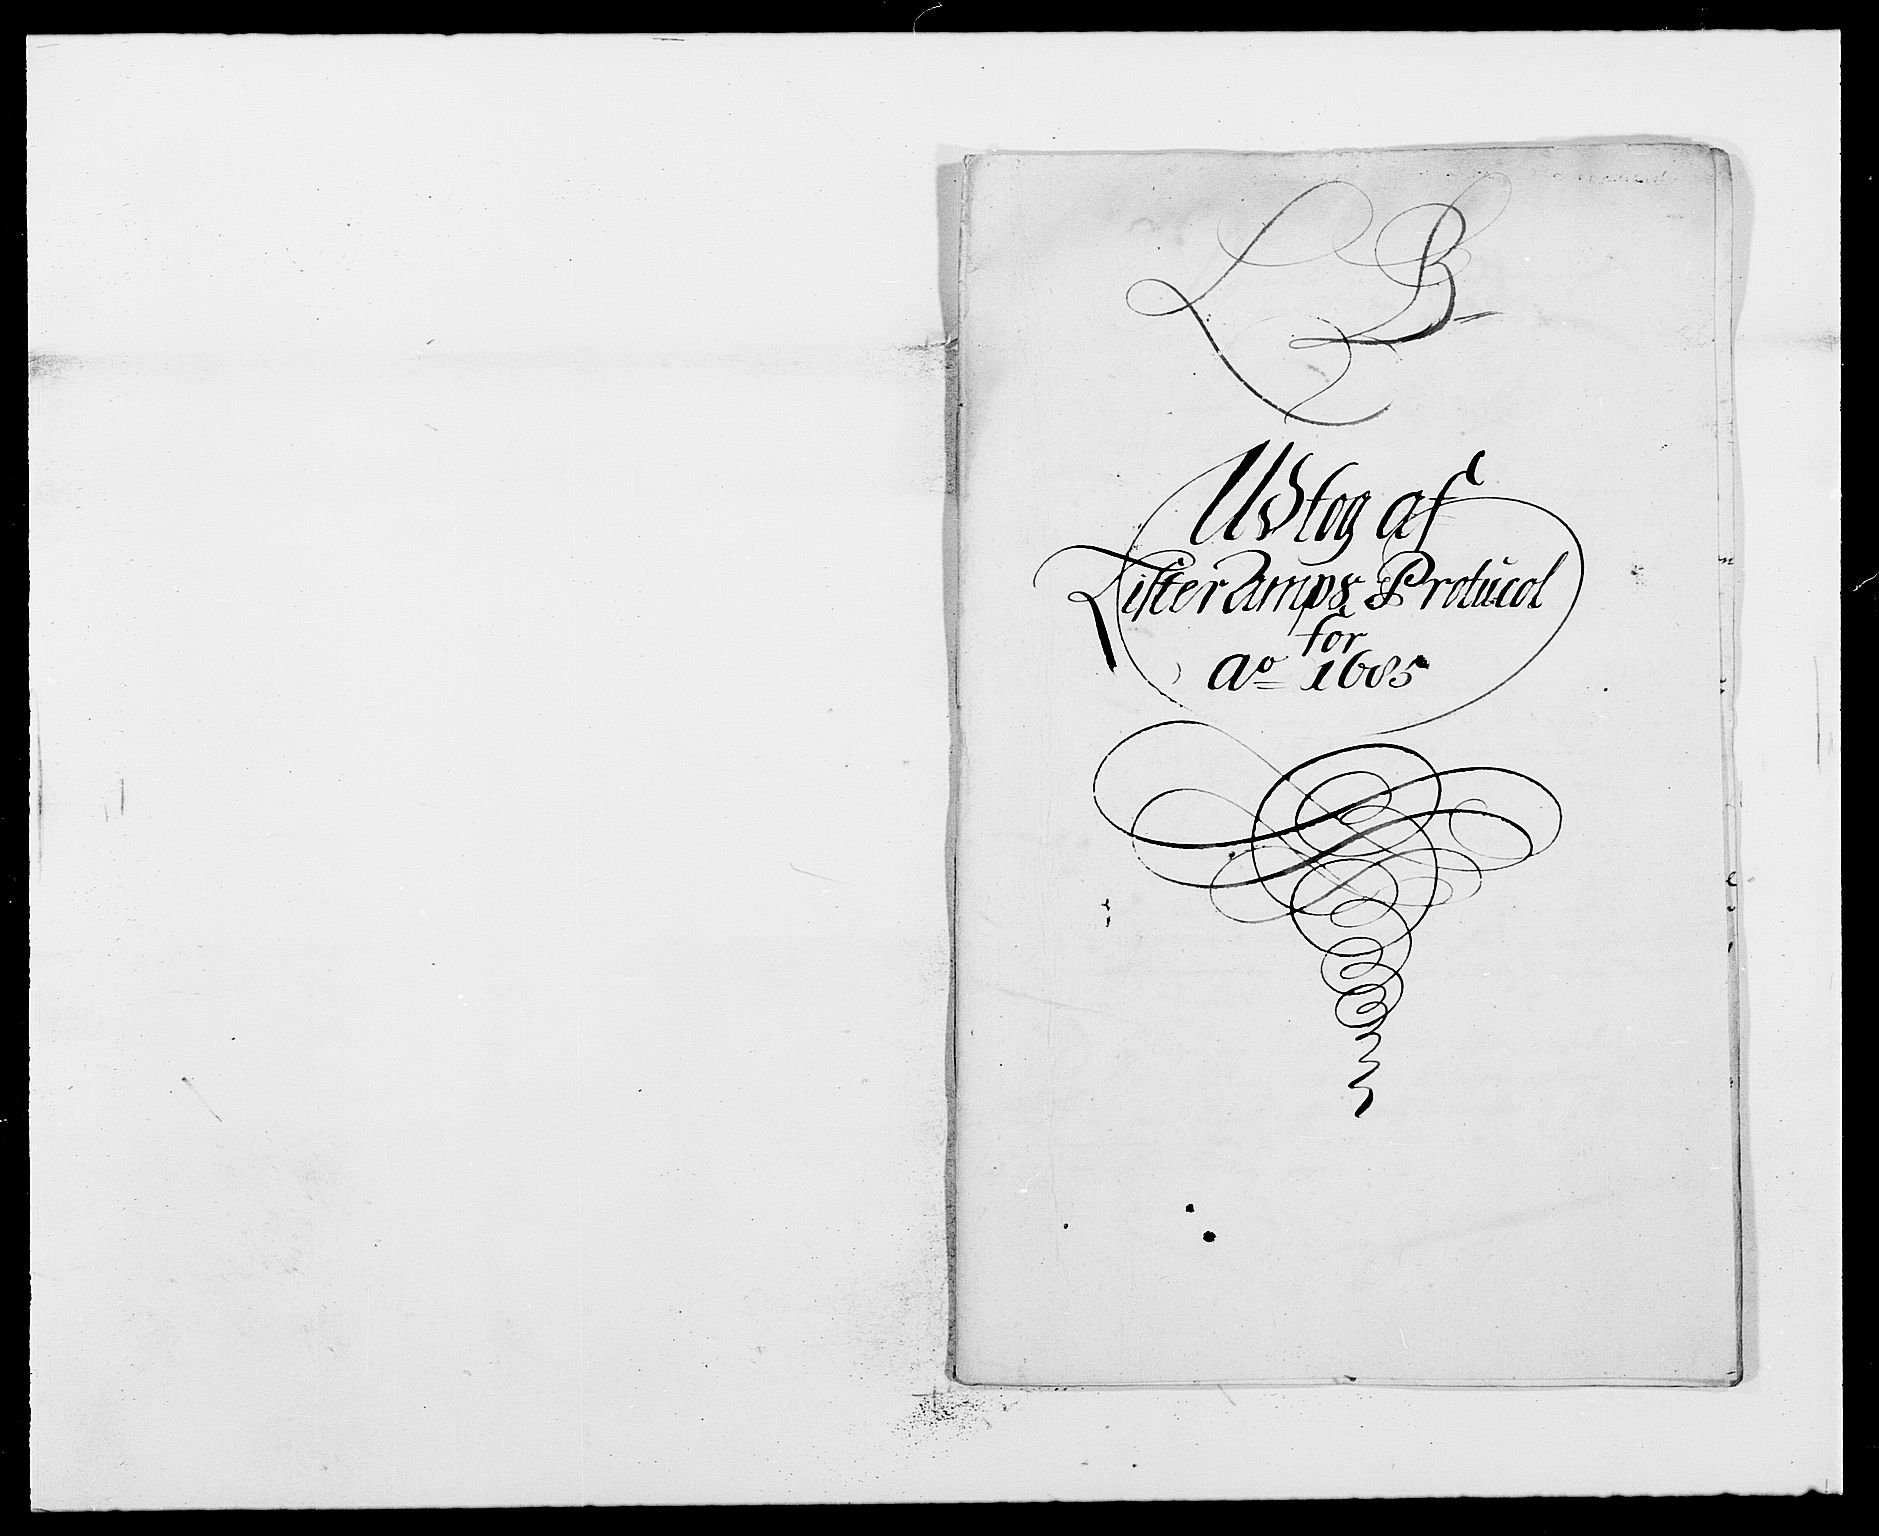 RA, Rentekammeret inntil 1814, Reviderte regnskaper, Fogderegnskap, R41/L2533: Fogderegnskap Lista, 1684-1685, s. 177